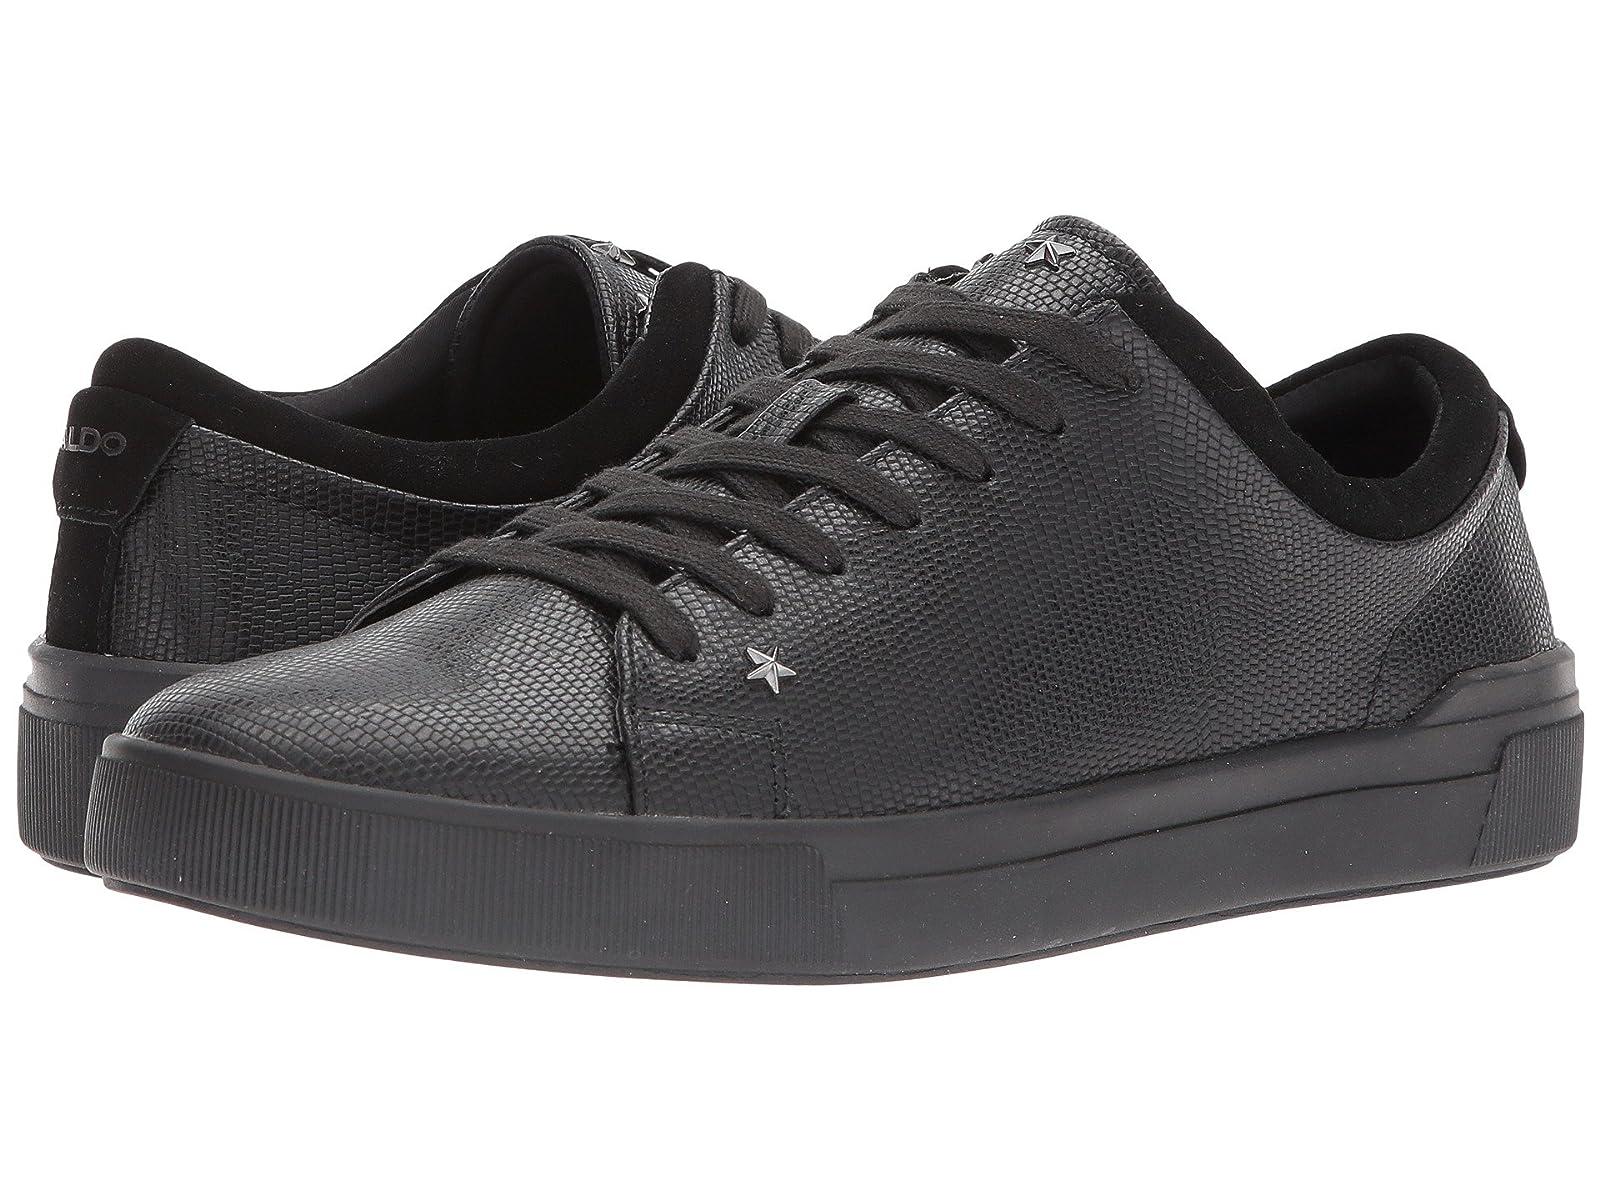 ALDO GodiaCheap and distinctive eye-catching shoes